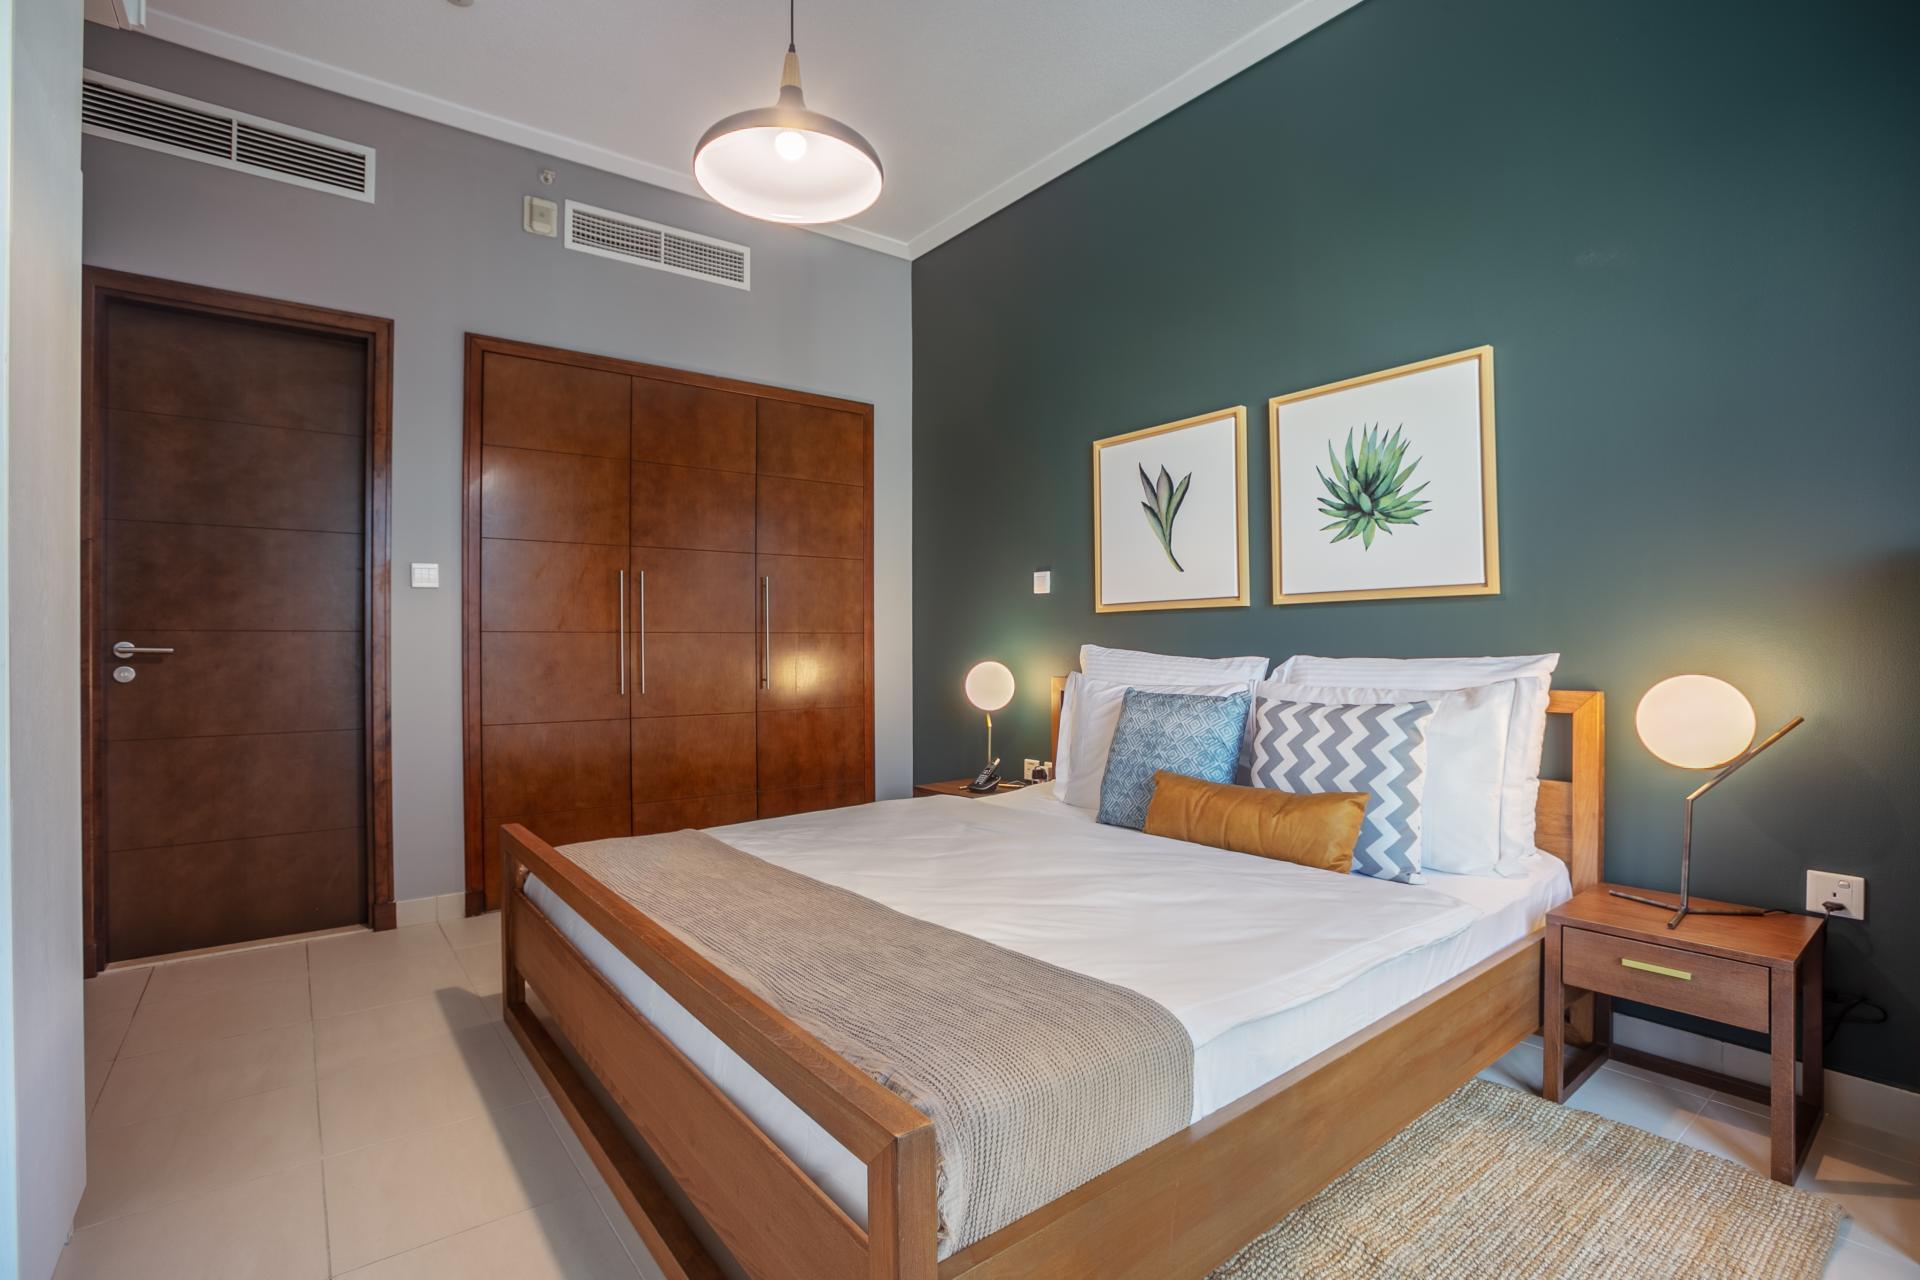 Bedroom at South Ridge Apartment, Financial District, Dubai